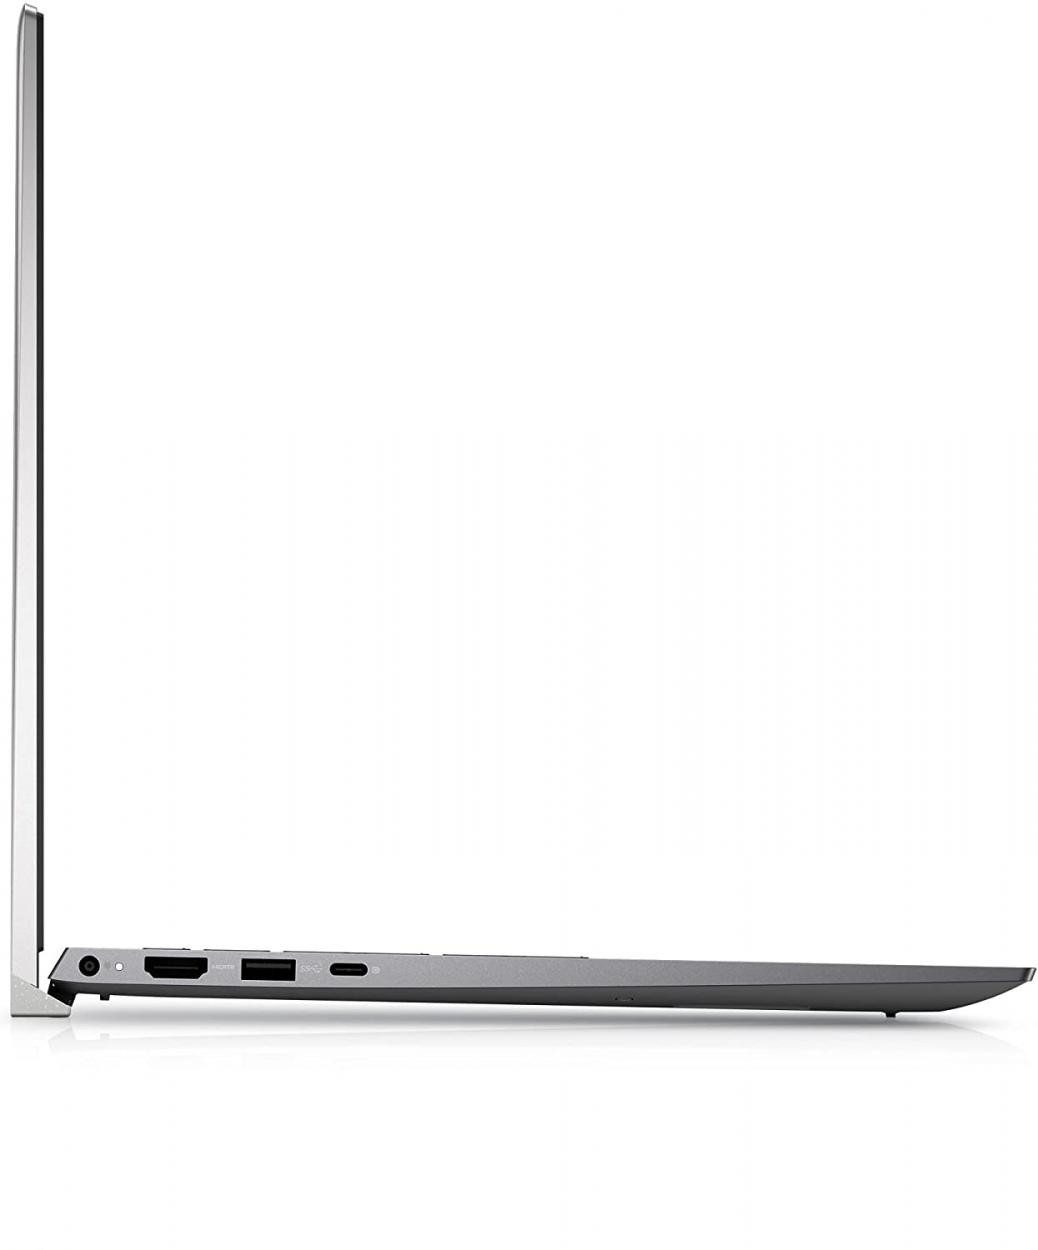 Ordinateur portable Dell Inspiron 15 5518 Argent - Core i7-H, MX450, SSD 512 Go - photo 4